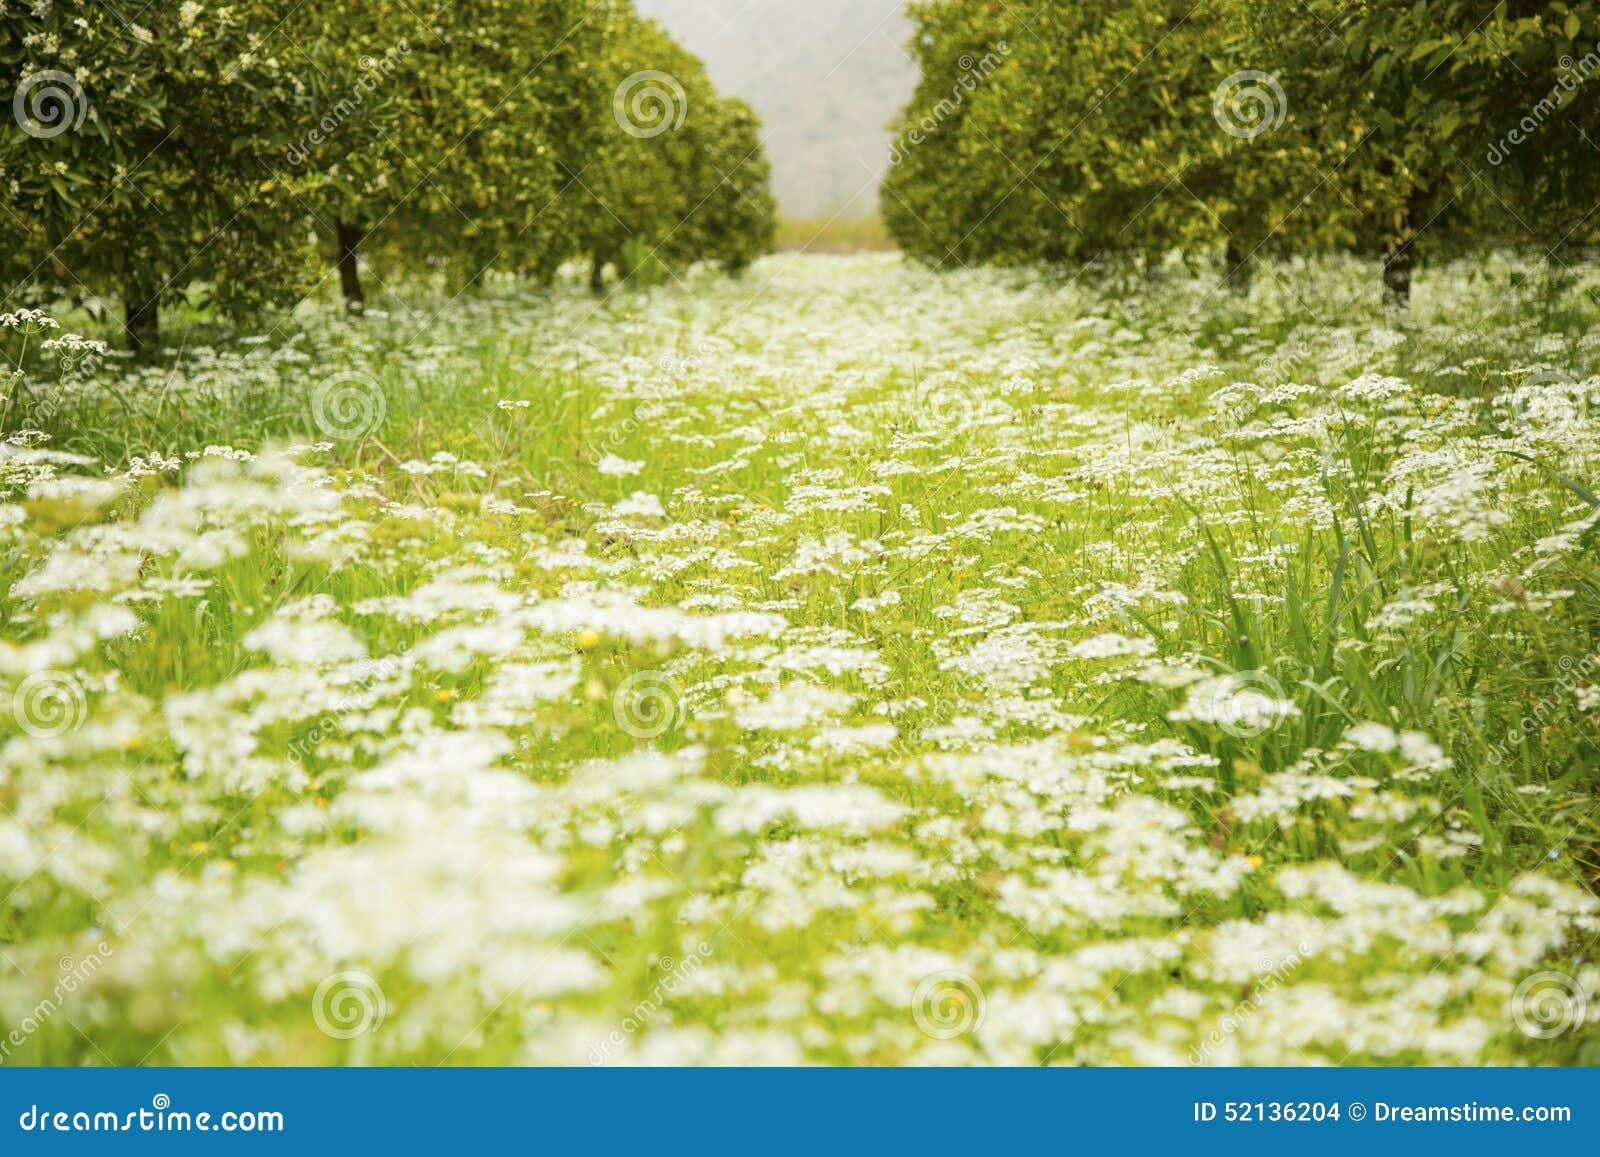 Beautiful flower meadow in springtime surrounded by orange trees beautiful flower meadow in springtime surrounded by orange trees izmirmasajfo